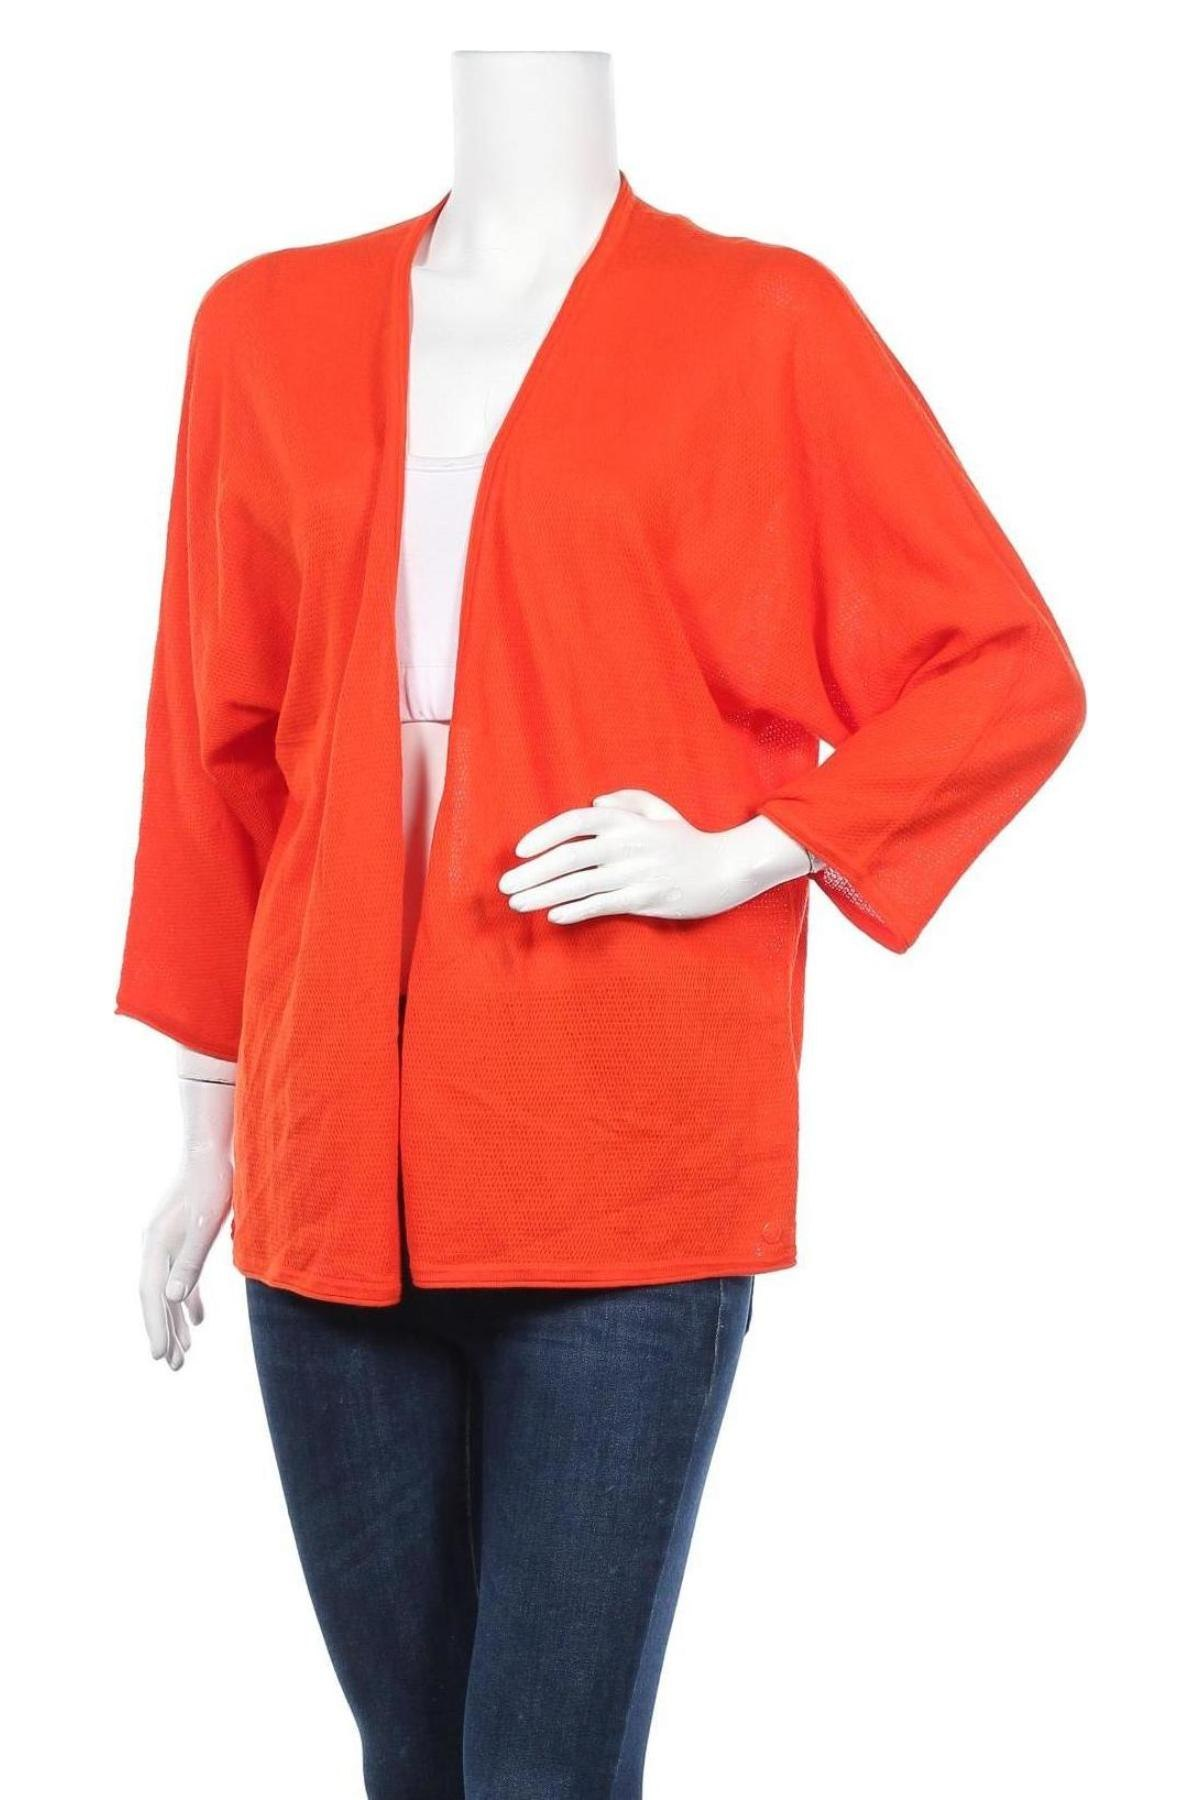 Дамска жилетка Tom Tailor, Размер 3XL, Цвят Оранжев, 100% памук, Цена 41,40лв.